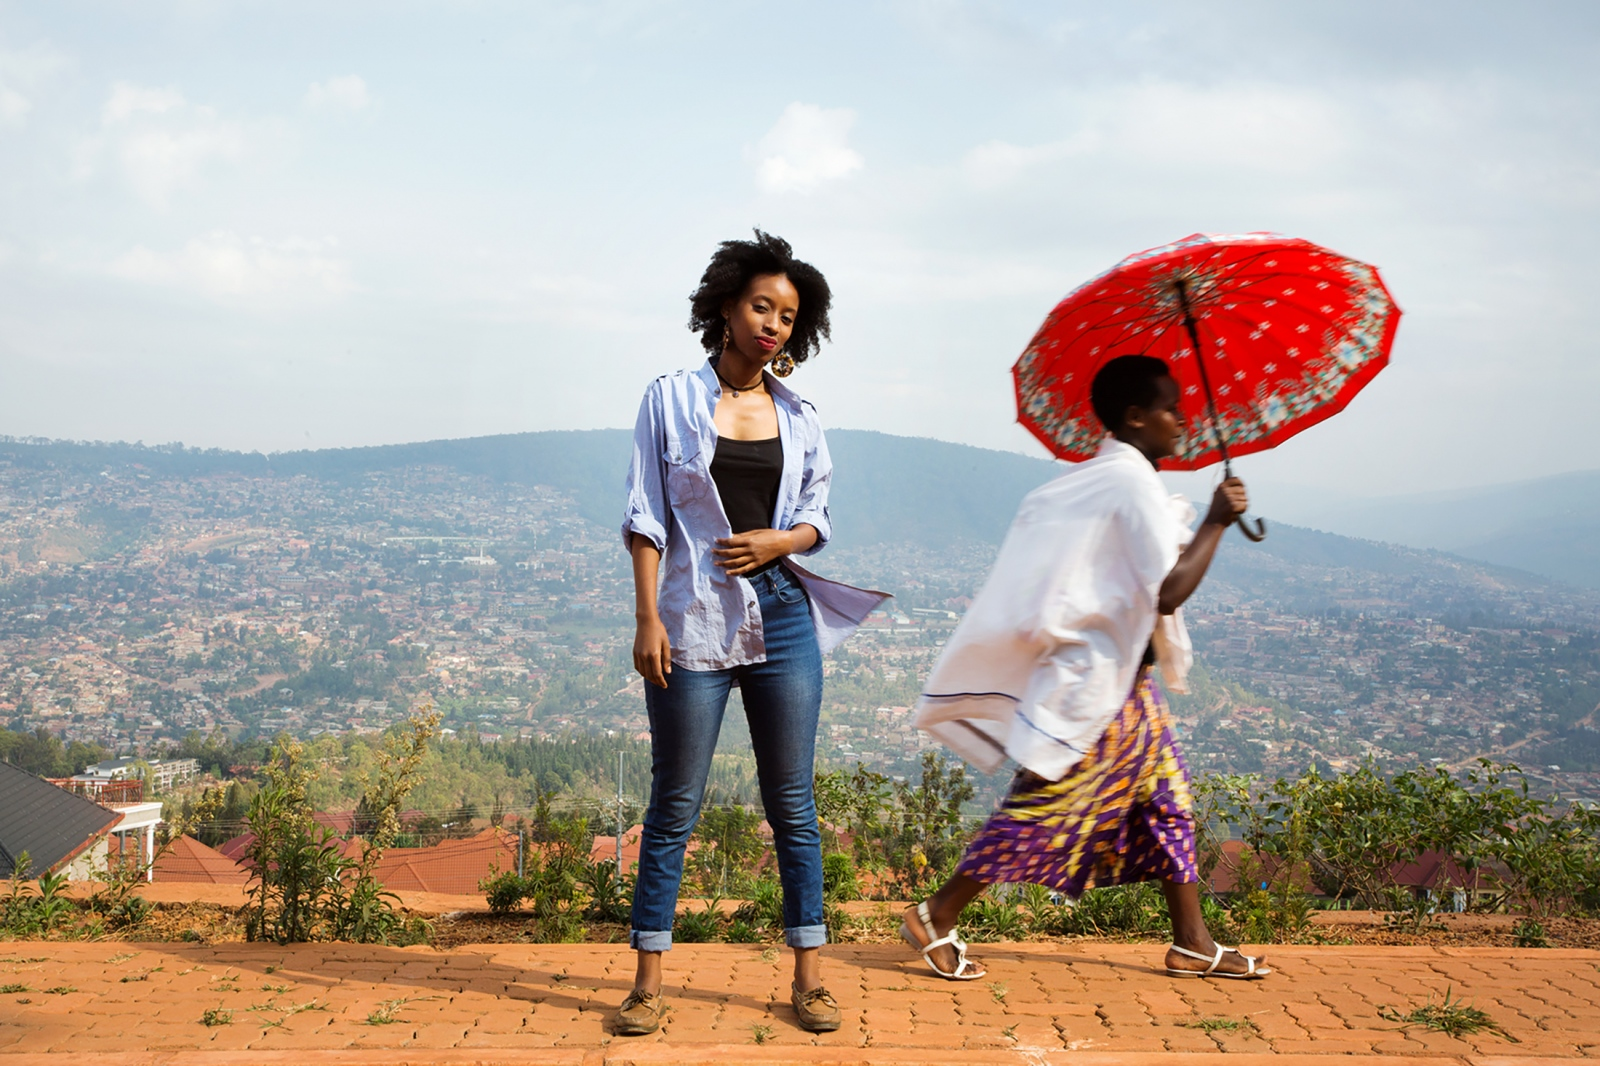 Photography image - Loading rwanda_3.jpg